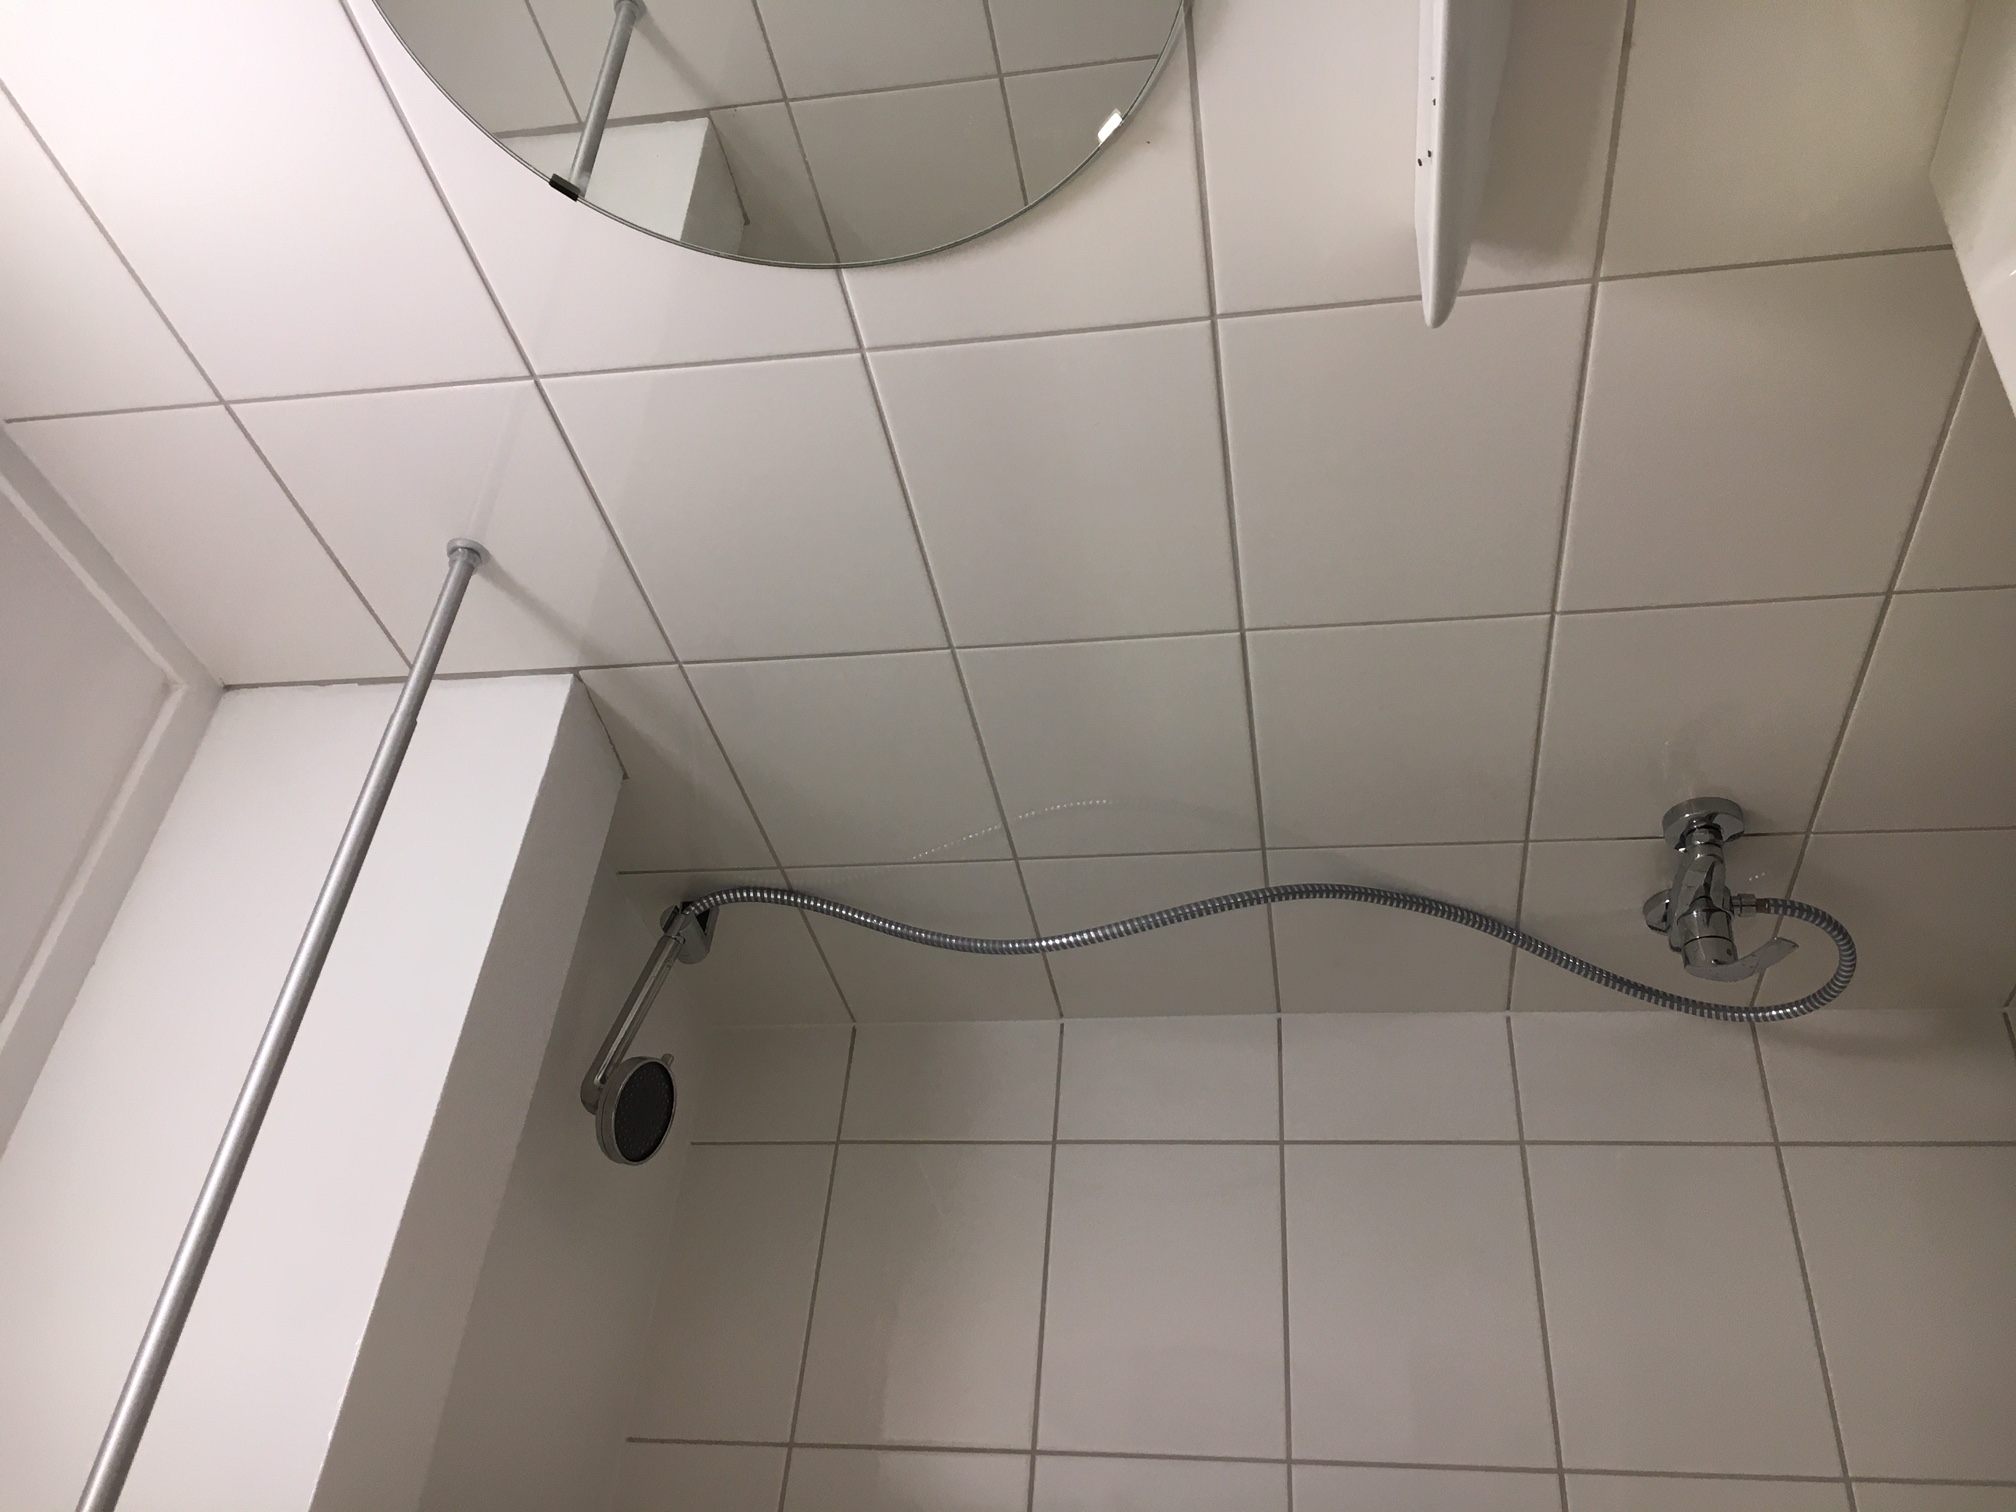 douche binnenstad Groningen